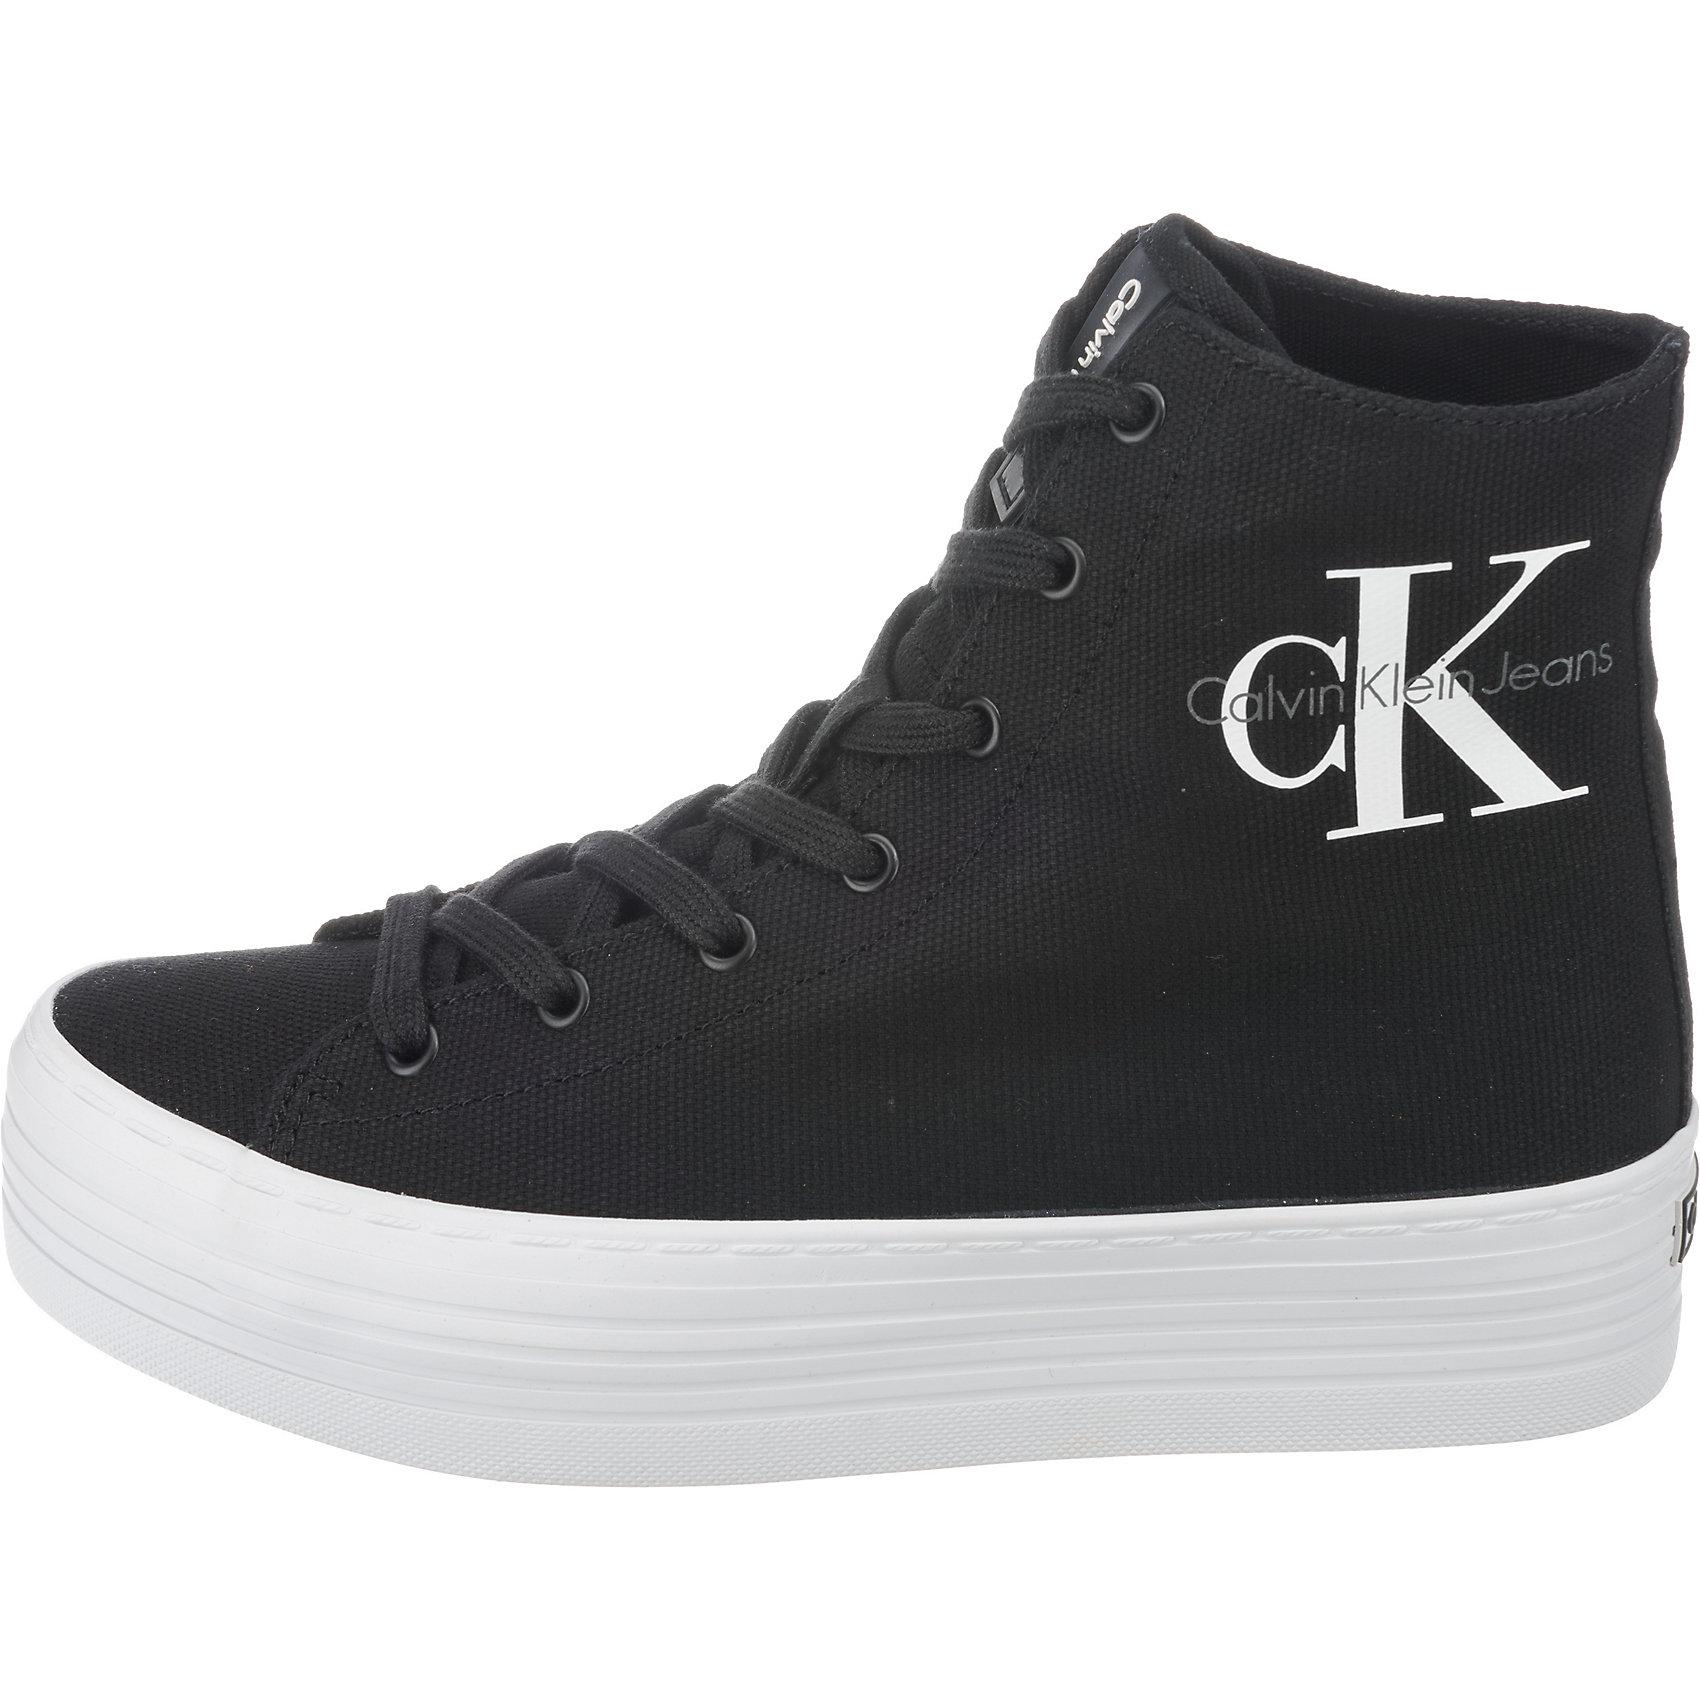 Neu CALVIN KLEIN JEANS ZABRINA CANVAS Sneakers High 7389351 für Damen